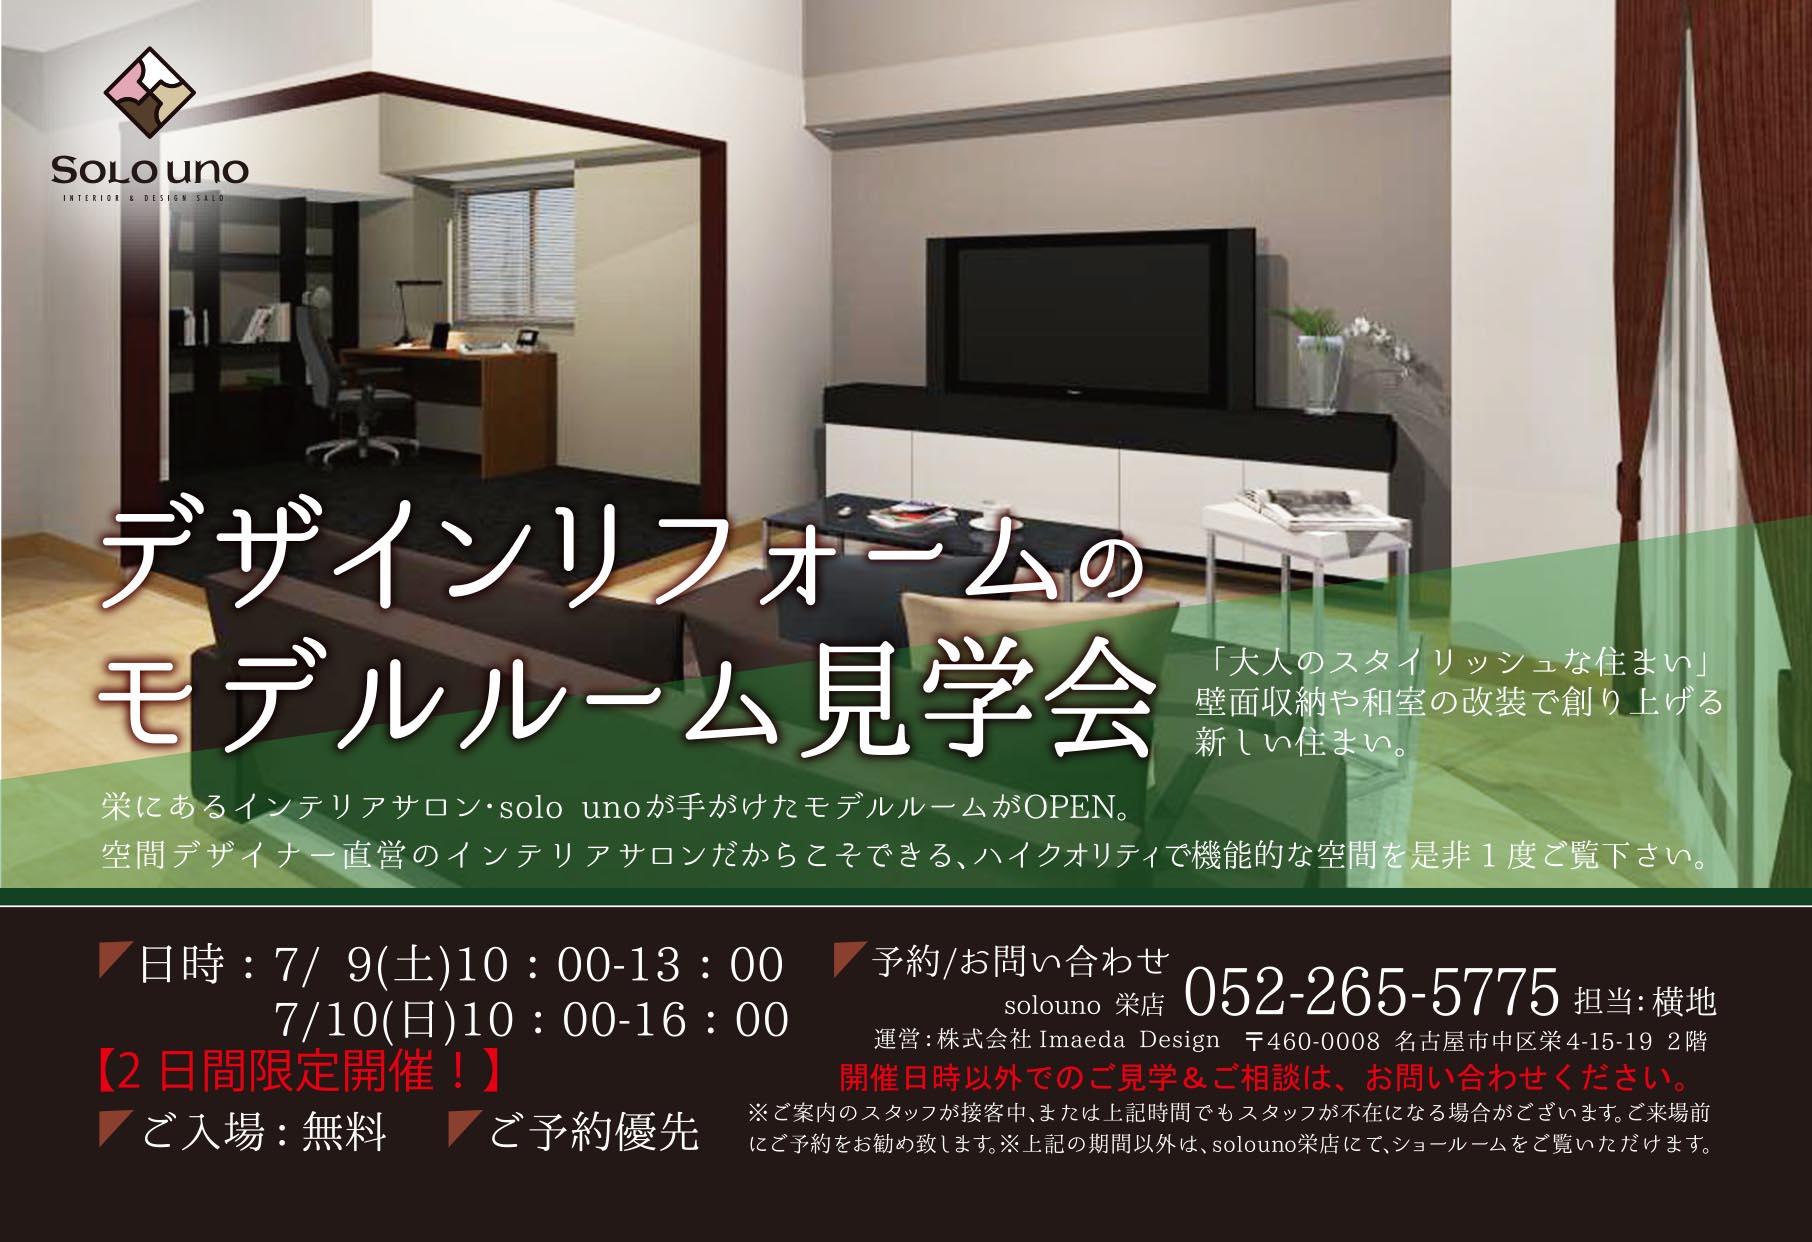 堂下様邸 見学会ハガキ ol 最終改訂版